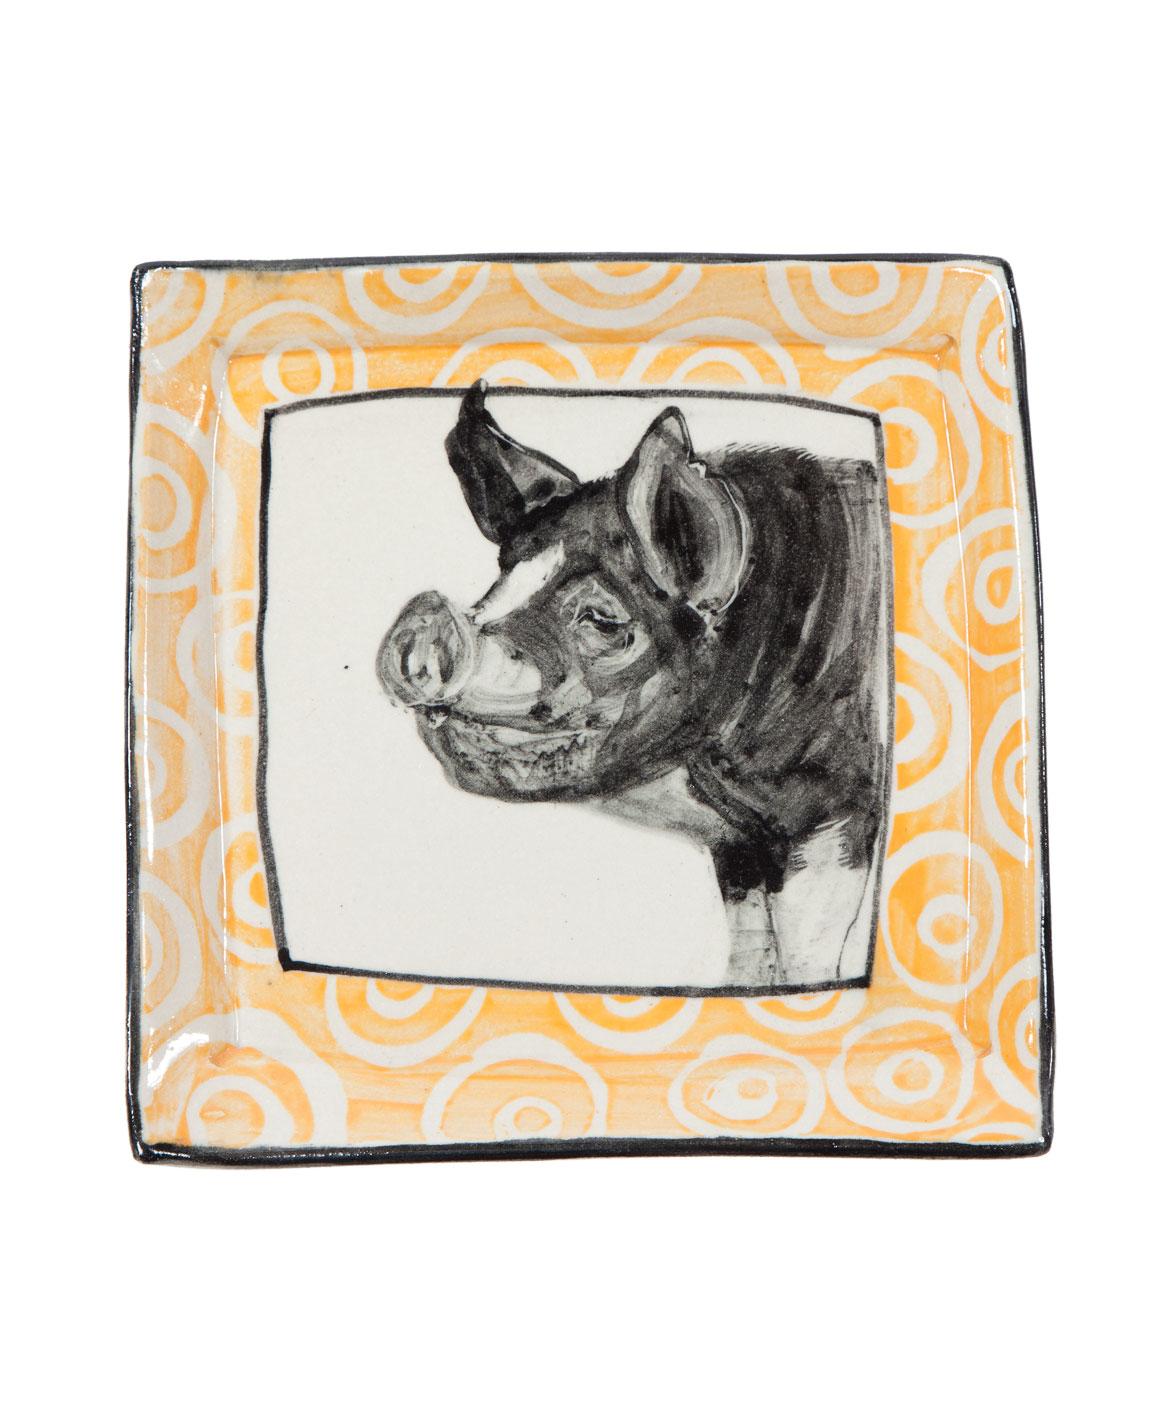 Artisan Pig Plate